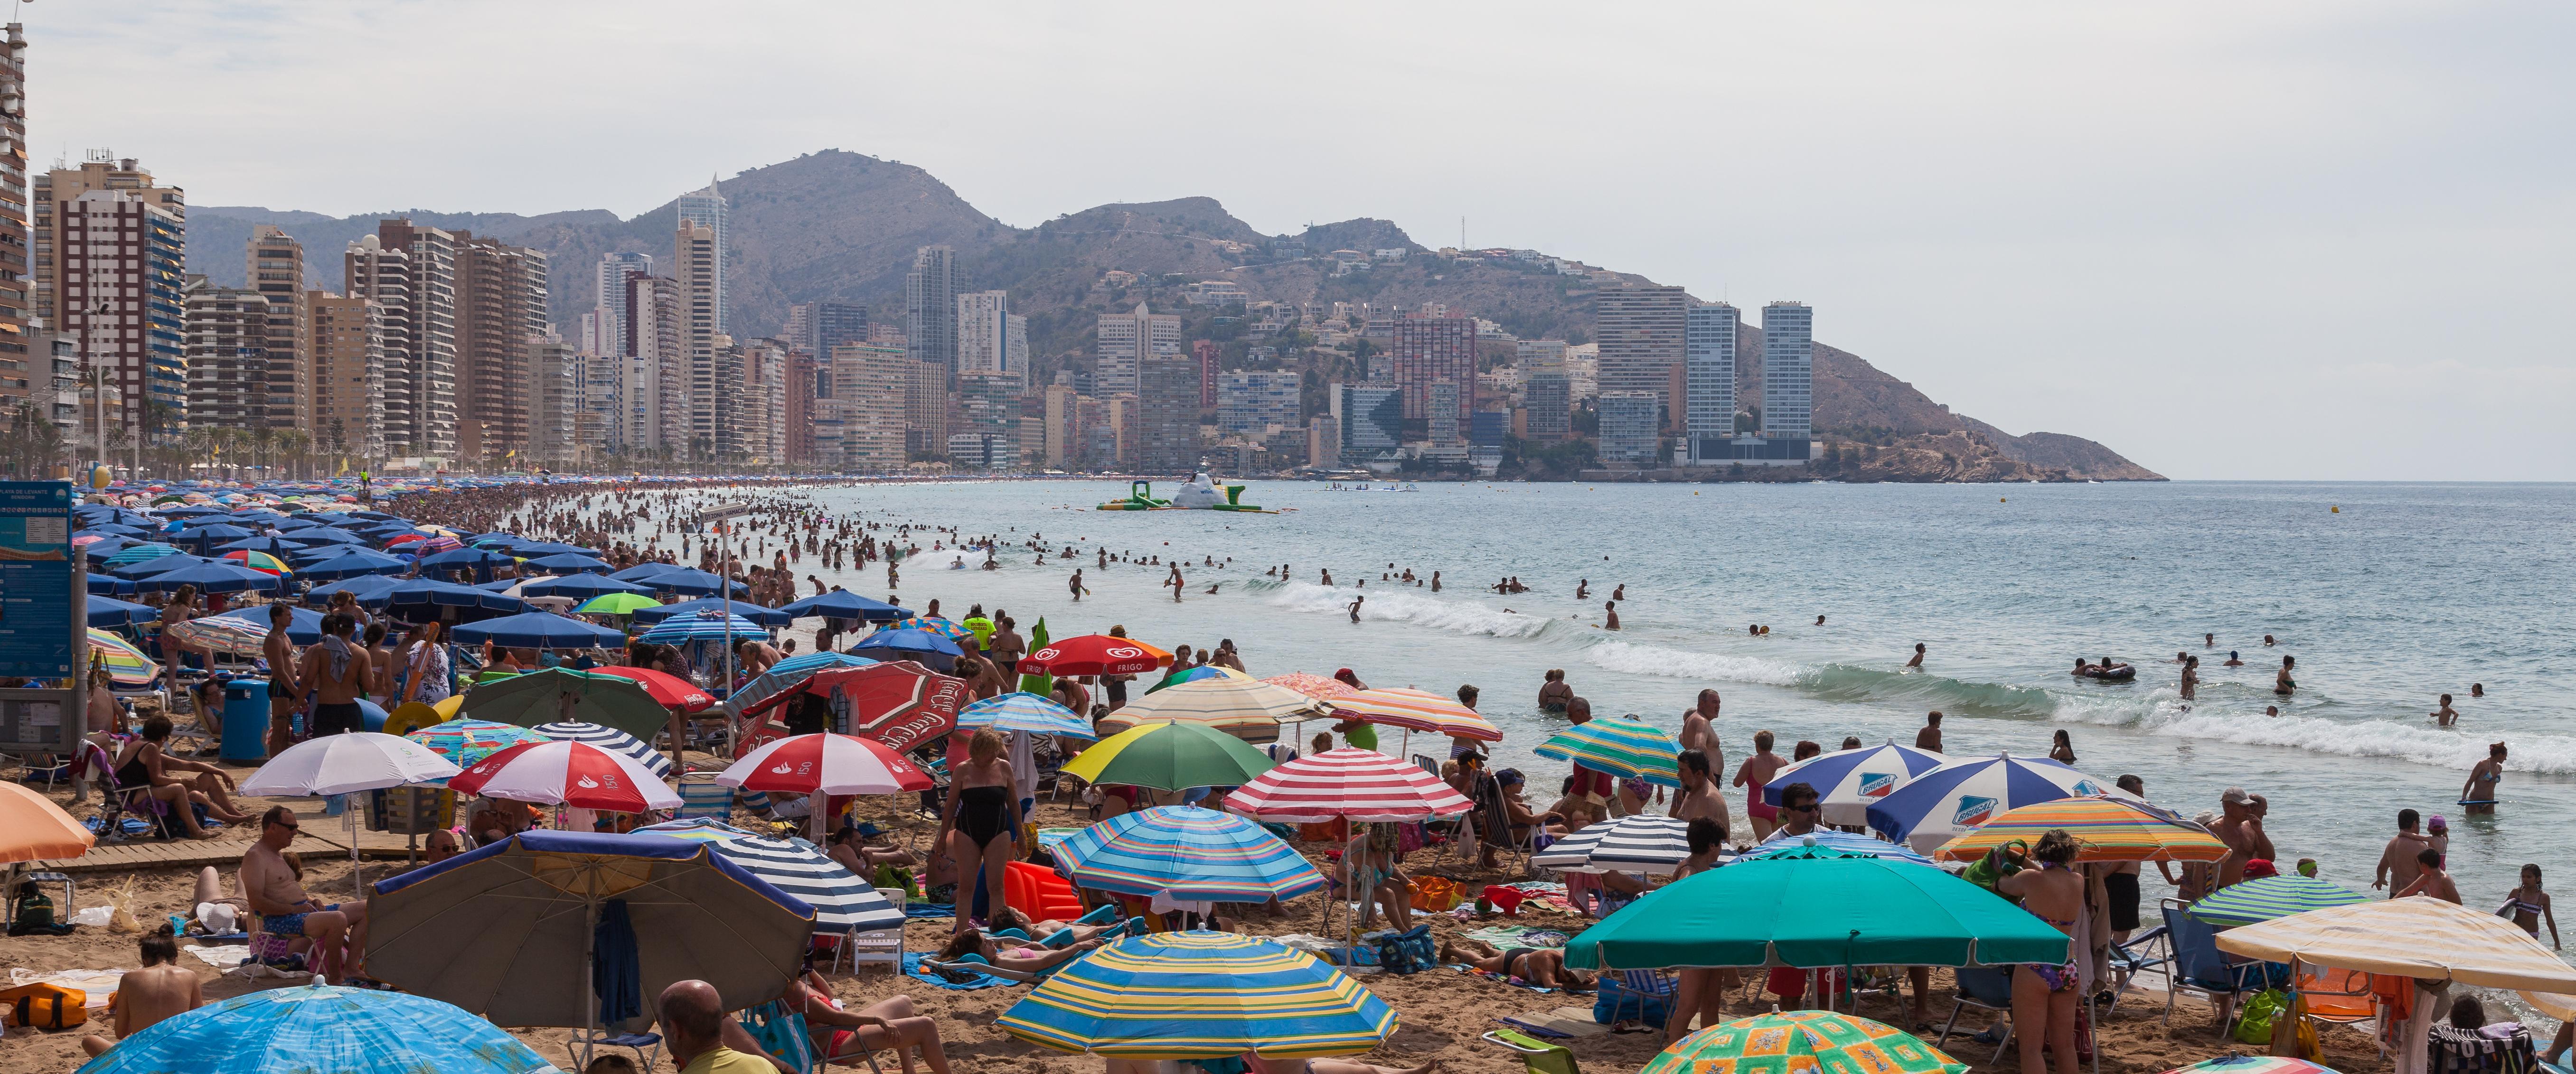 Datei:Playa de Levante, Benidorm, España, 2014-07-02, DD 05.JPG – Wikitravel